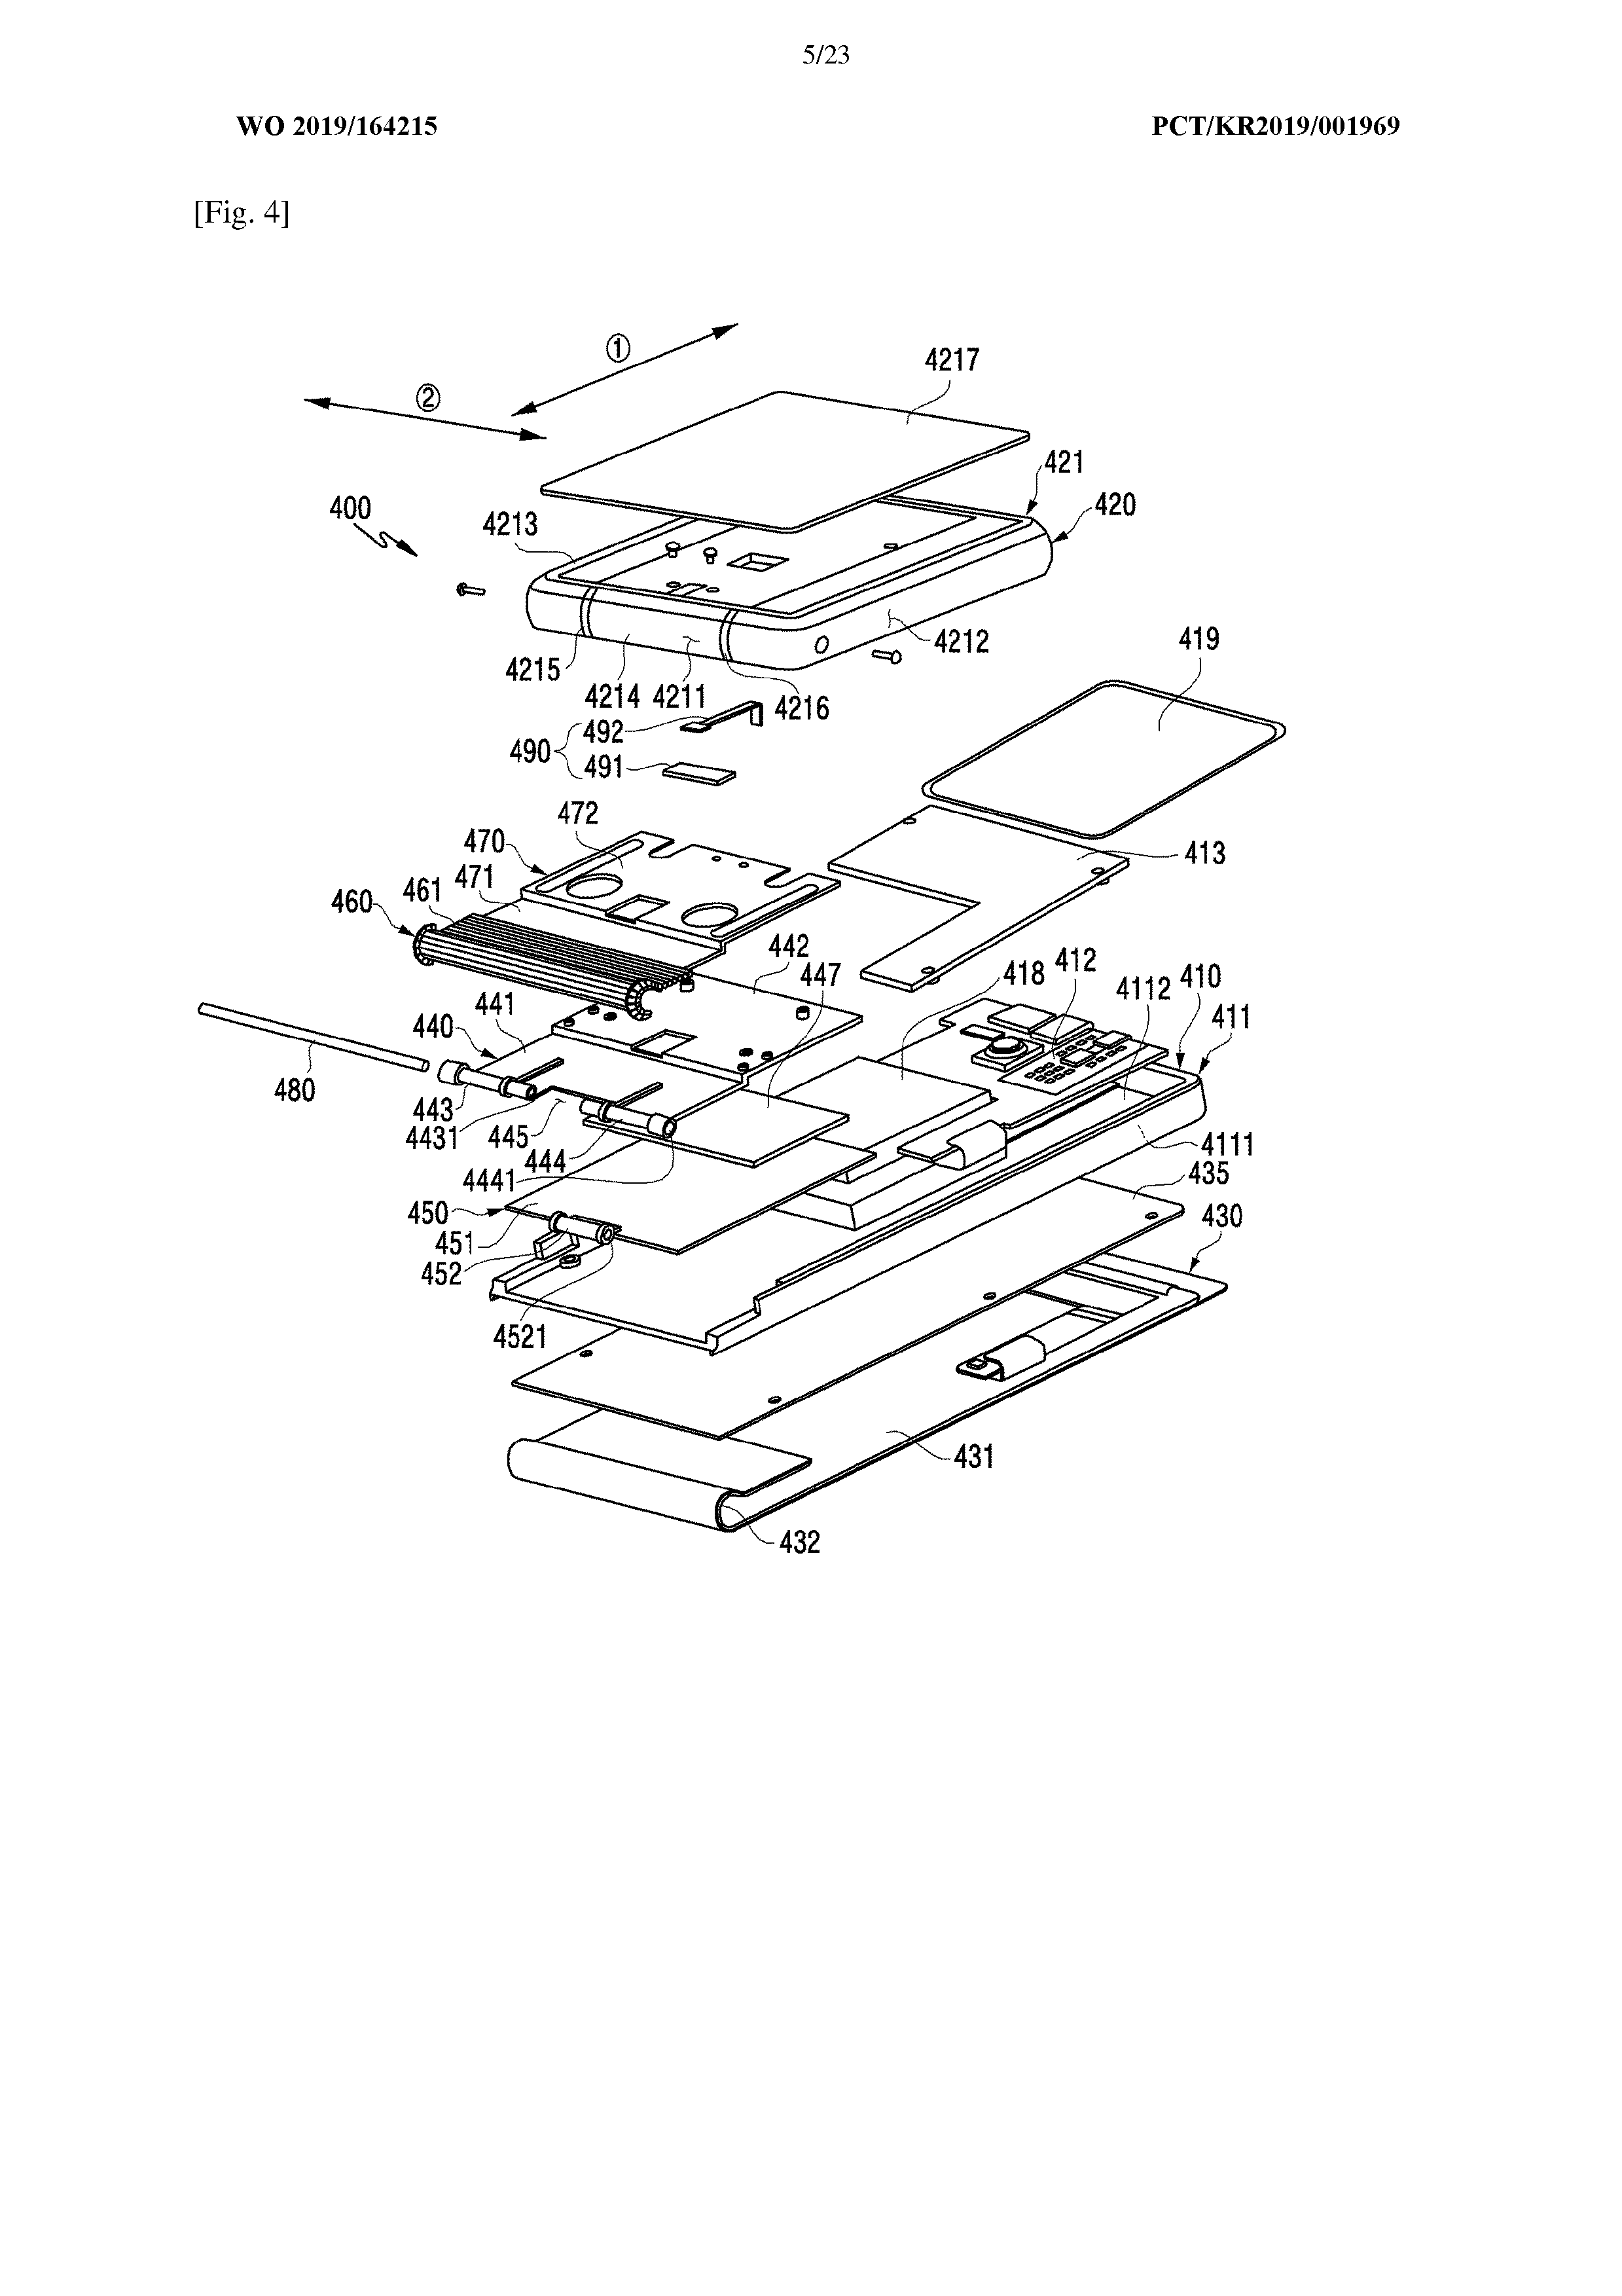 Samsung Extendable Sliding Display Patent 3